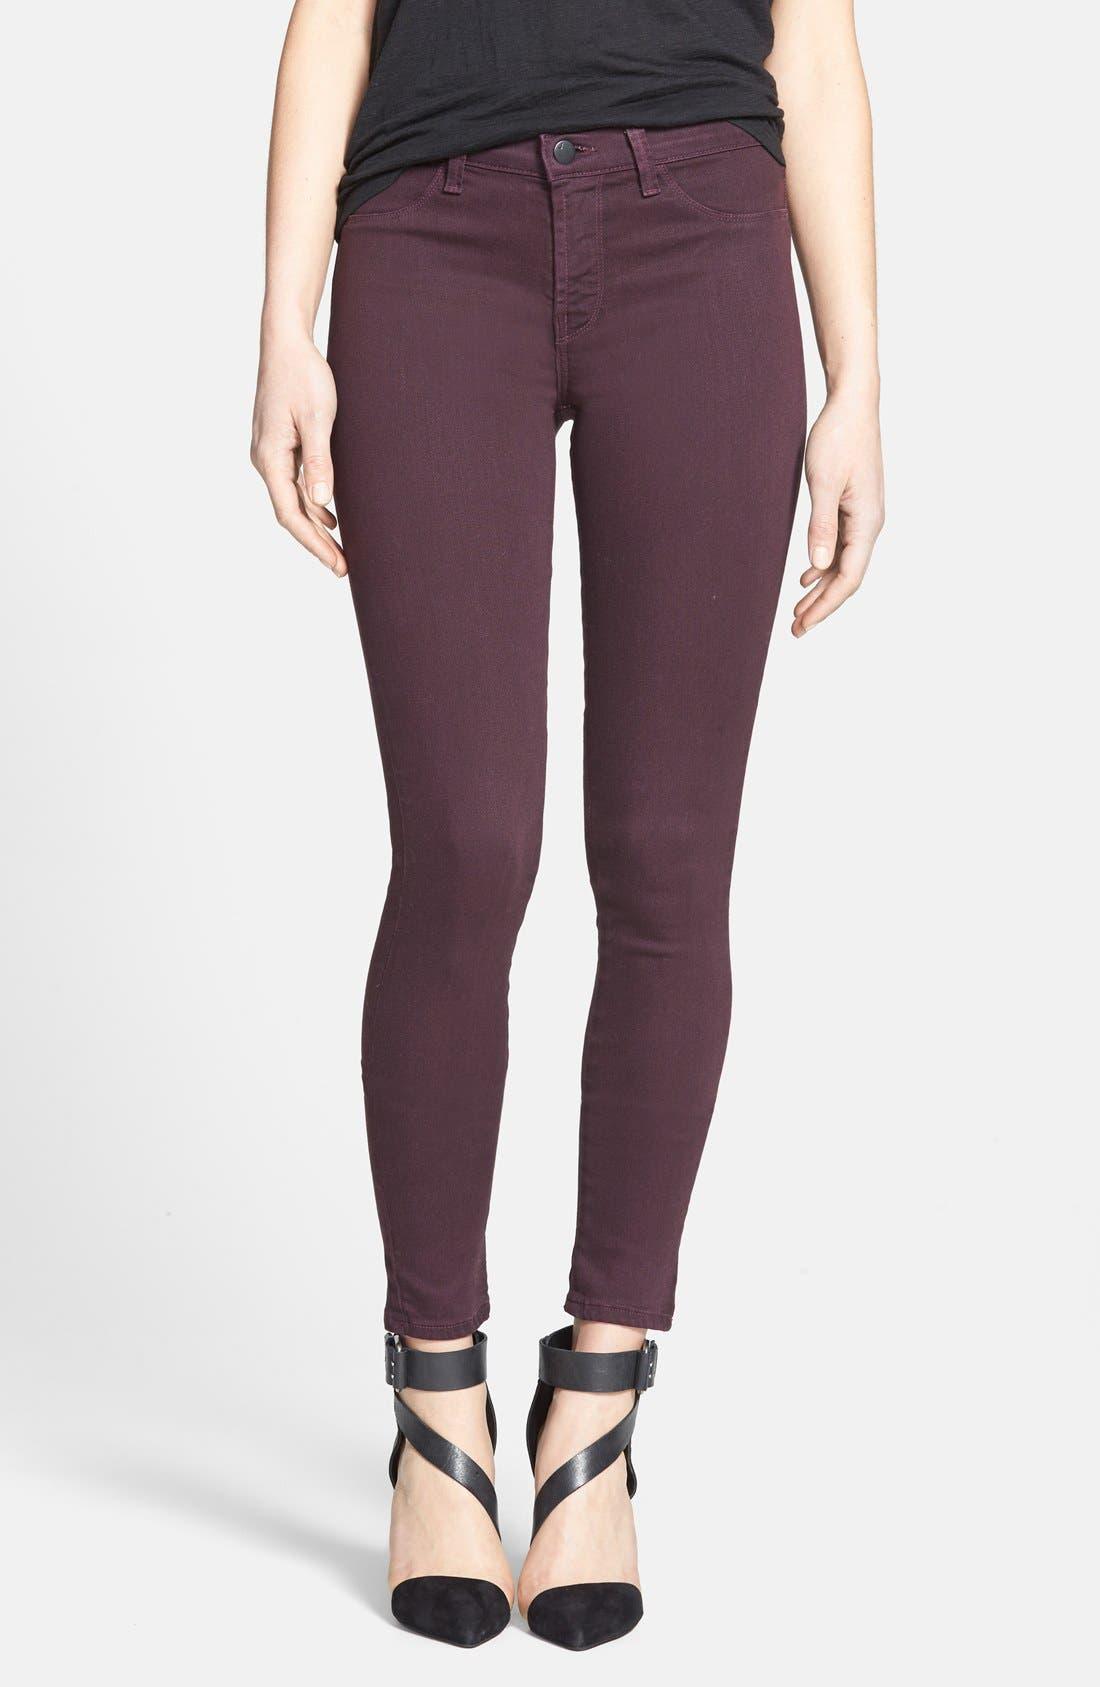 Main Image - J Brand '485' Skinny Jeans (Dark Plum)